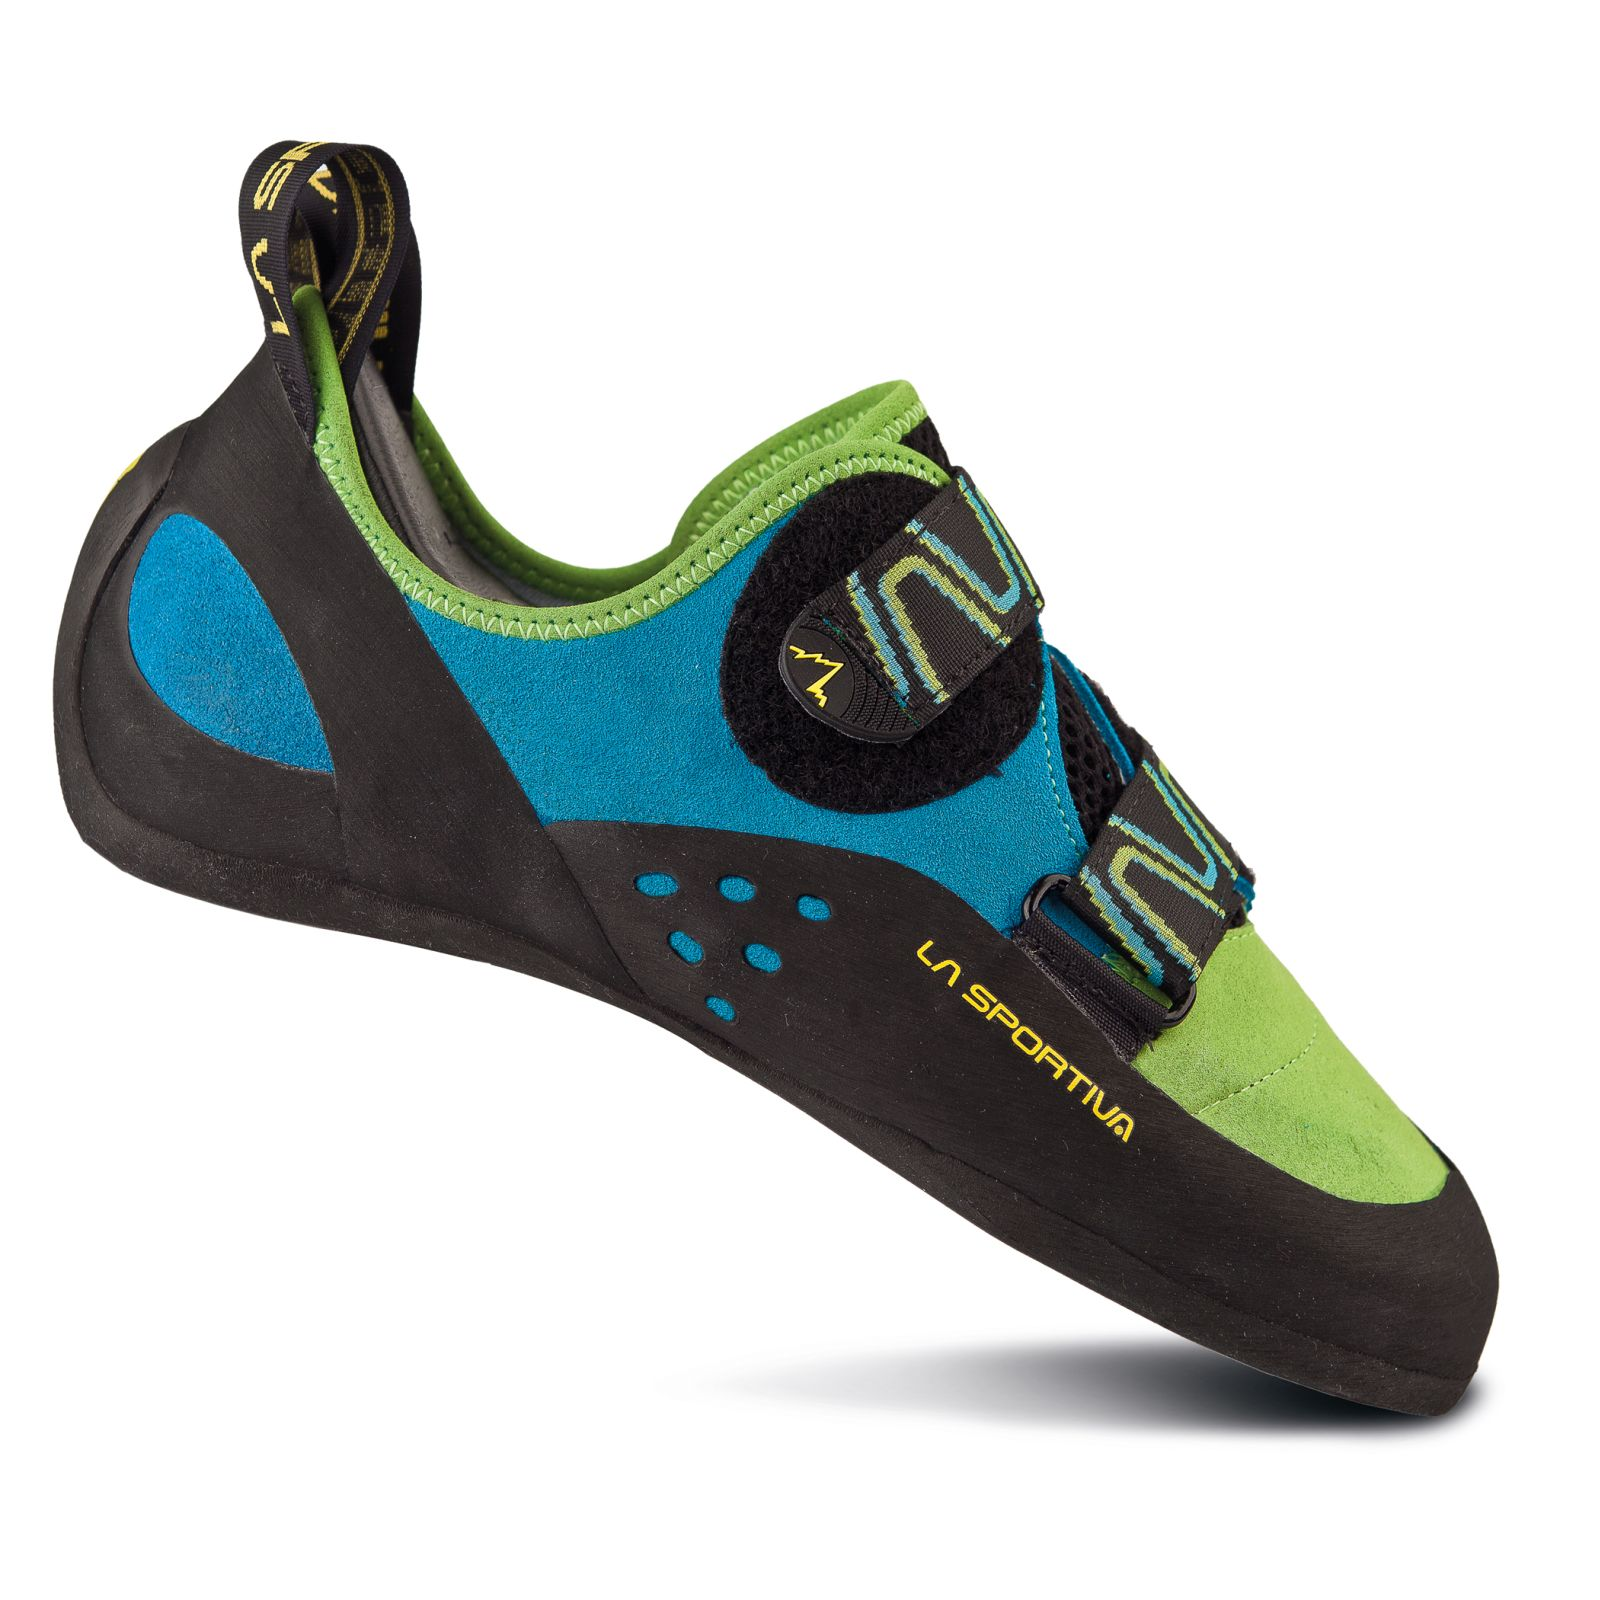 photo: La Sportiva Men's Katana climbing shoe